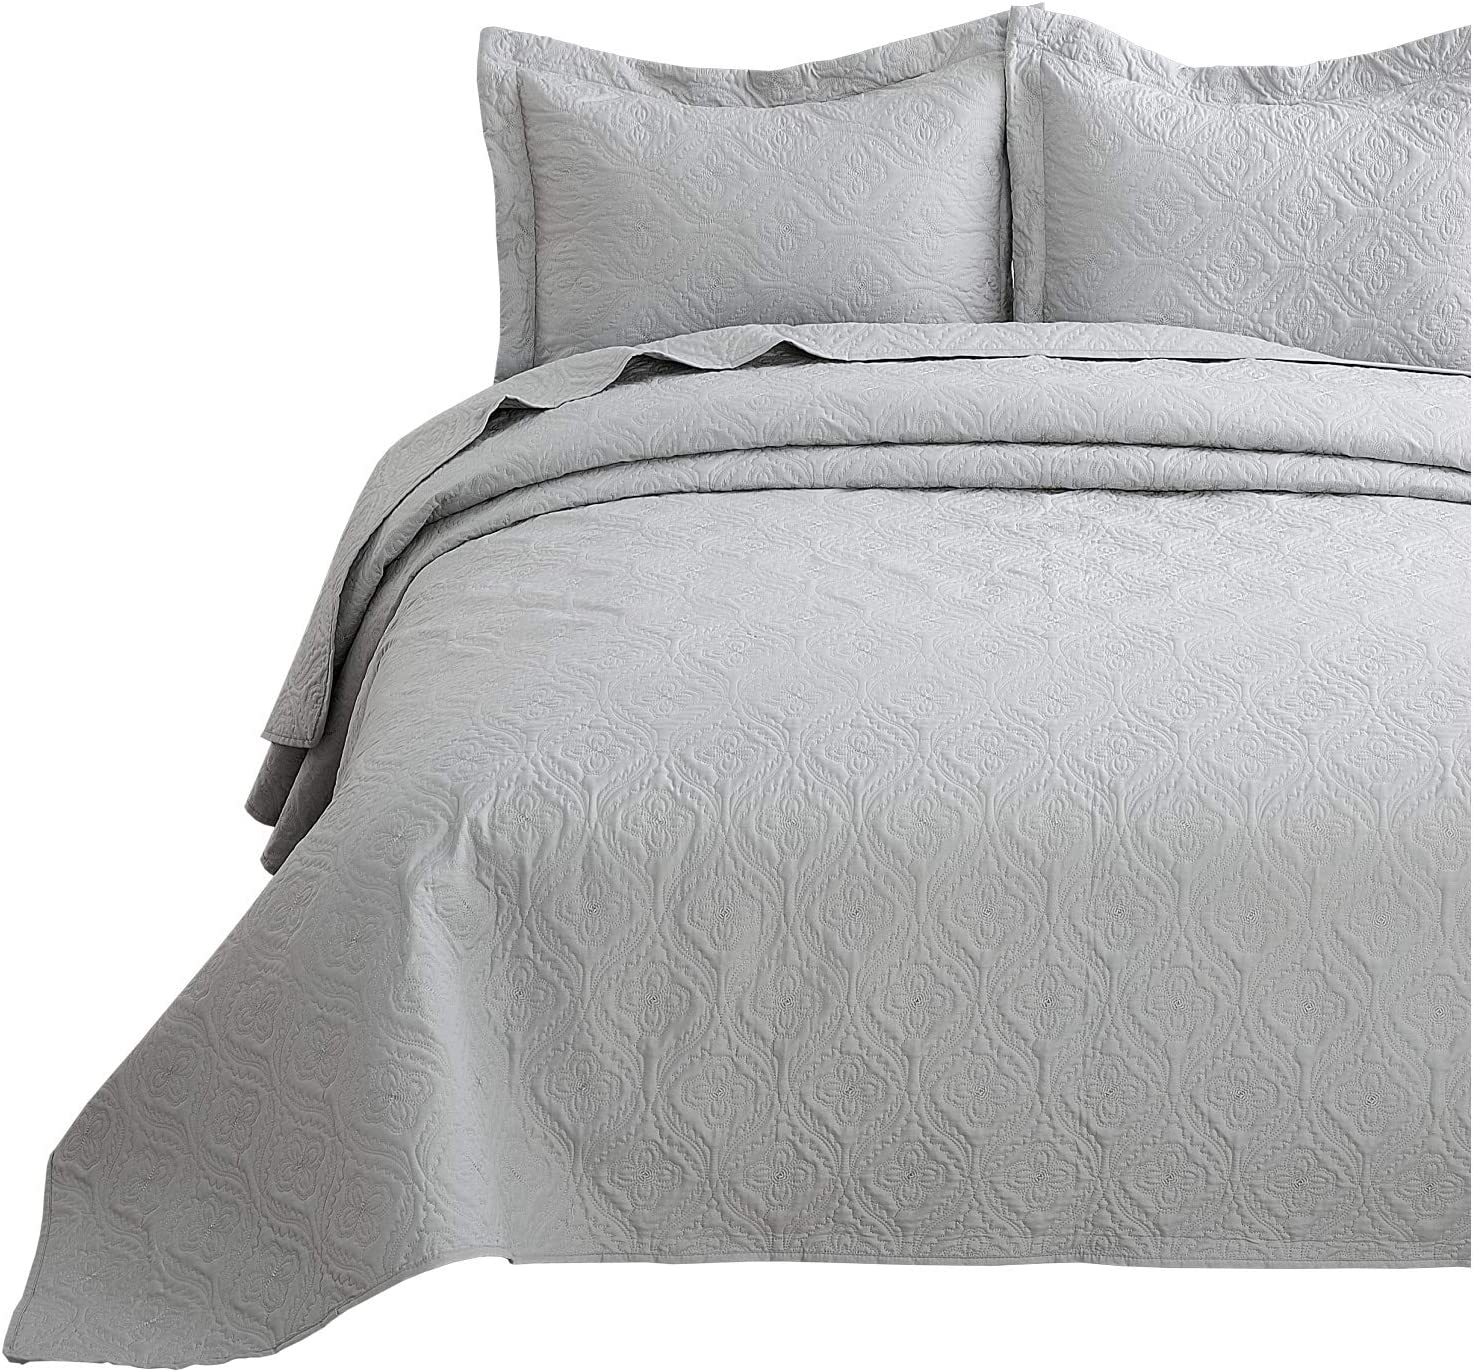 Bedsure Quilt Set Light Grey King Size (106x96 inches) - Flower Petal Design - Soft Microfiber Lightweight Coverlet Bedspread for All Season - 3 Pieces (Includes 1 Quilt, 2 Shams)